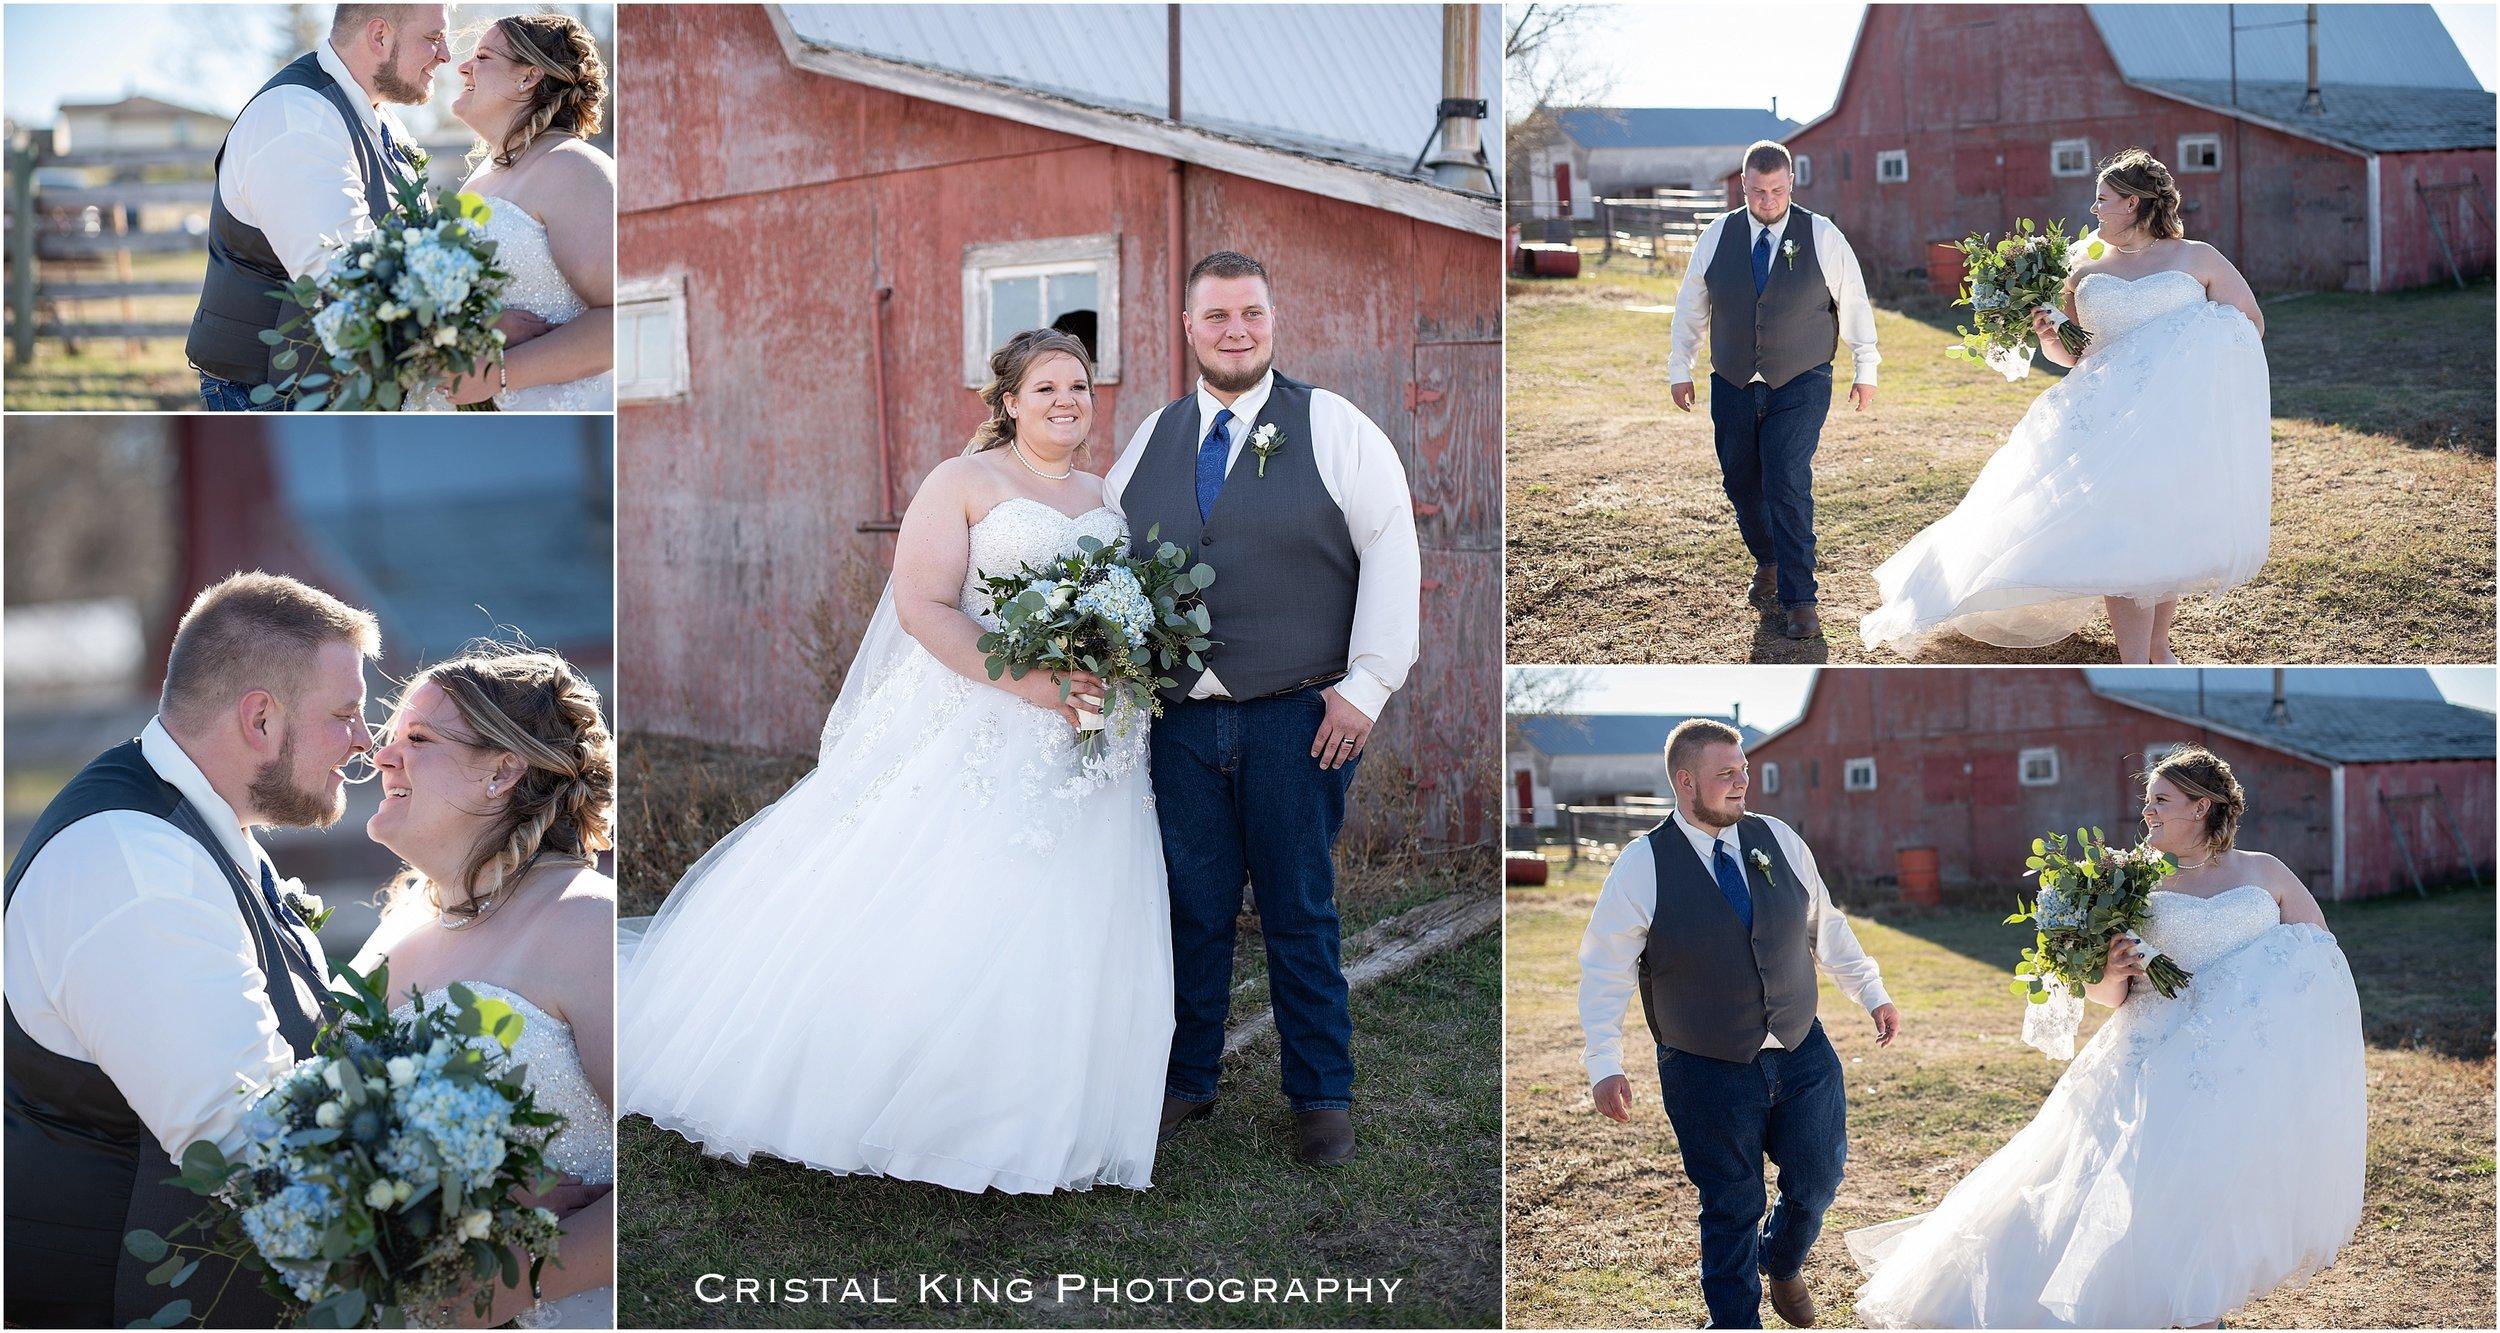 Tracy-Kyles-Wedding-105.jpg